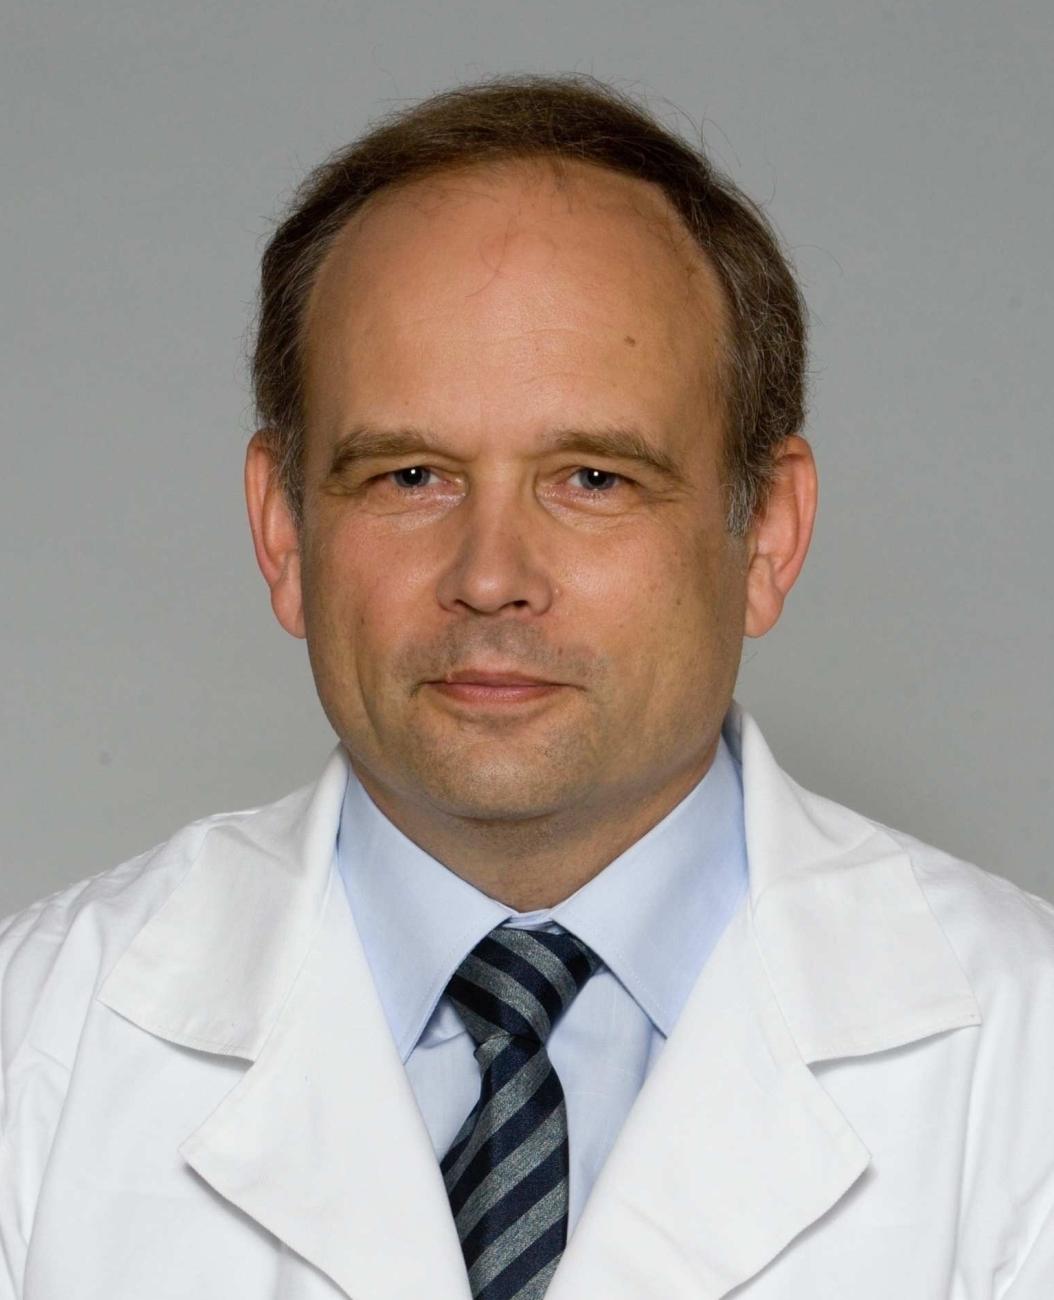 Pavel Koranda